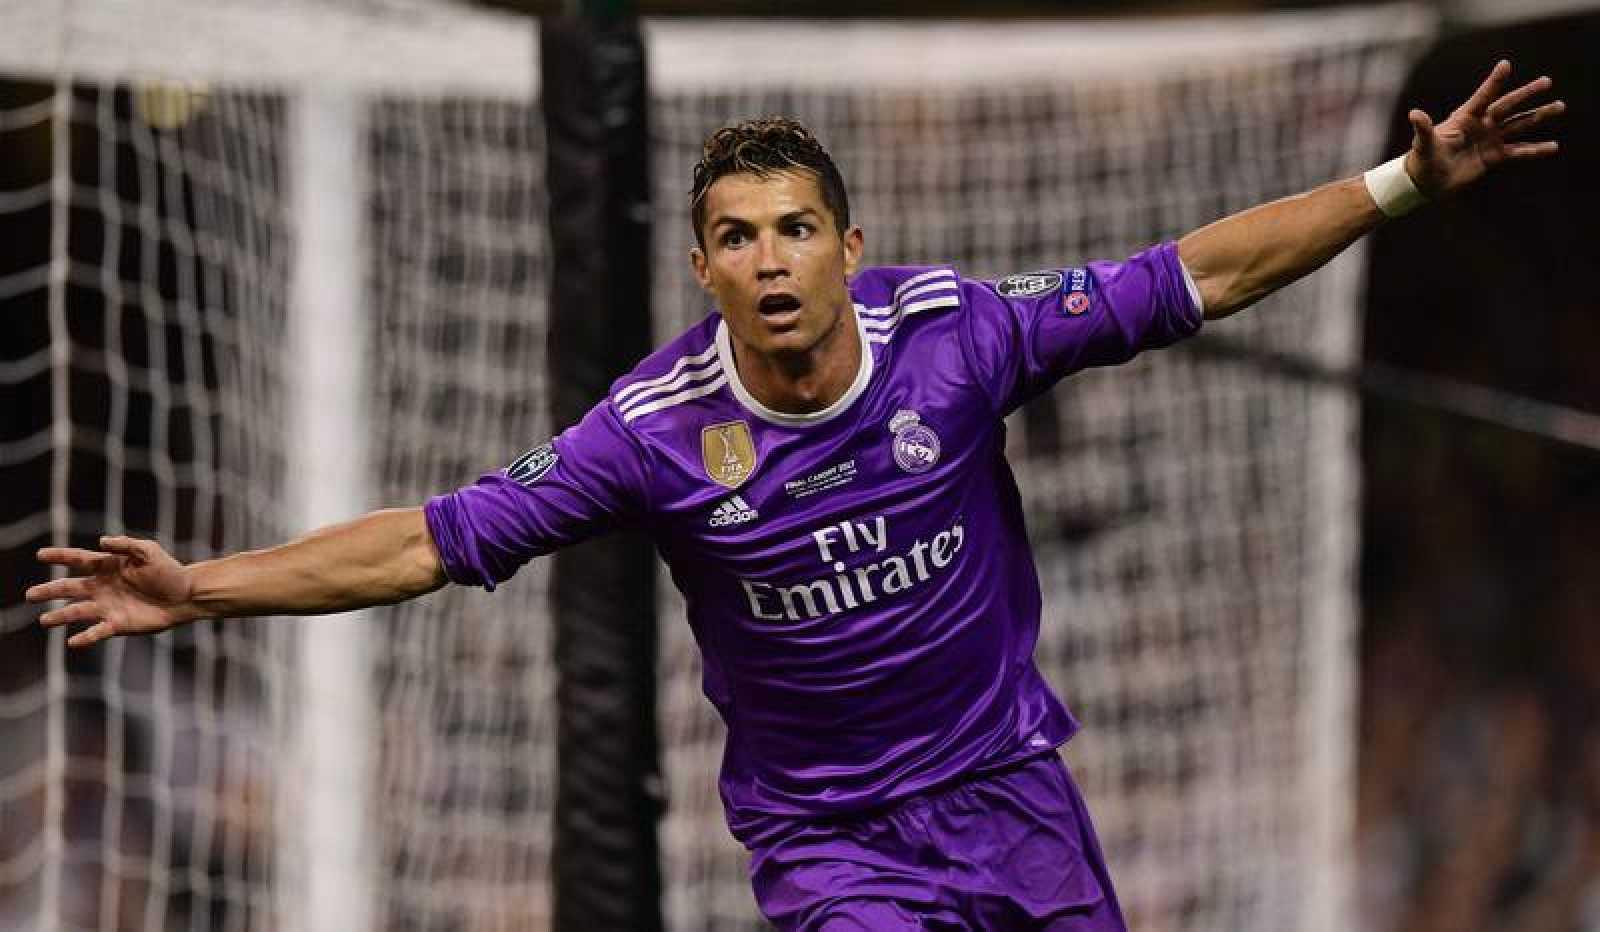 Cristiano Ronaldo celebra uno de los goles 137db7bf8a2ba